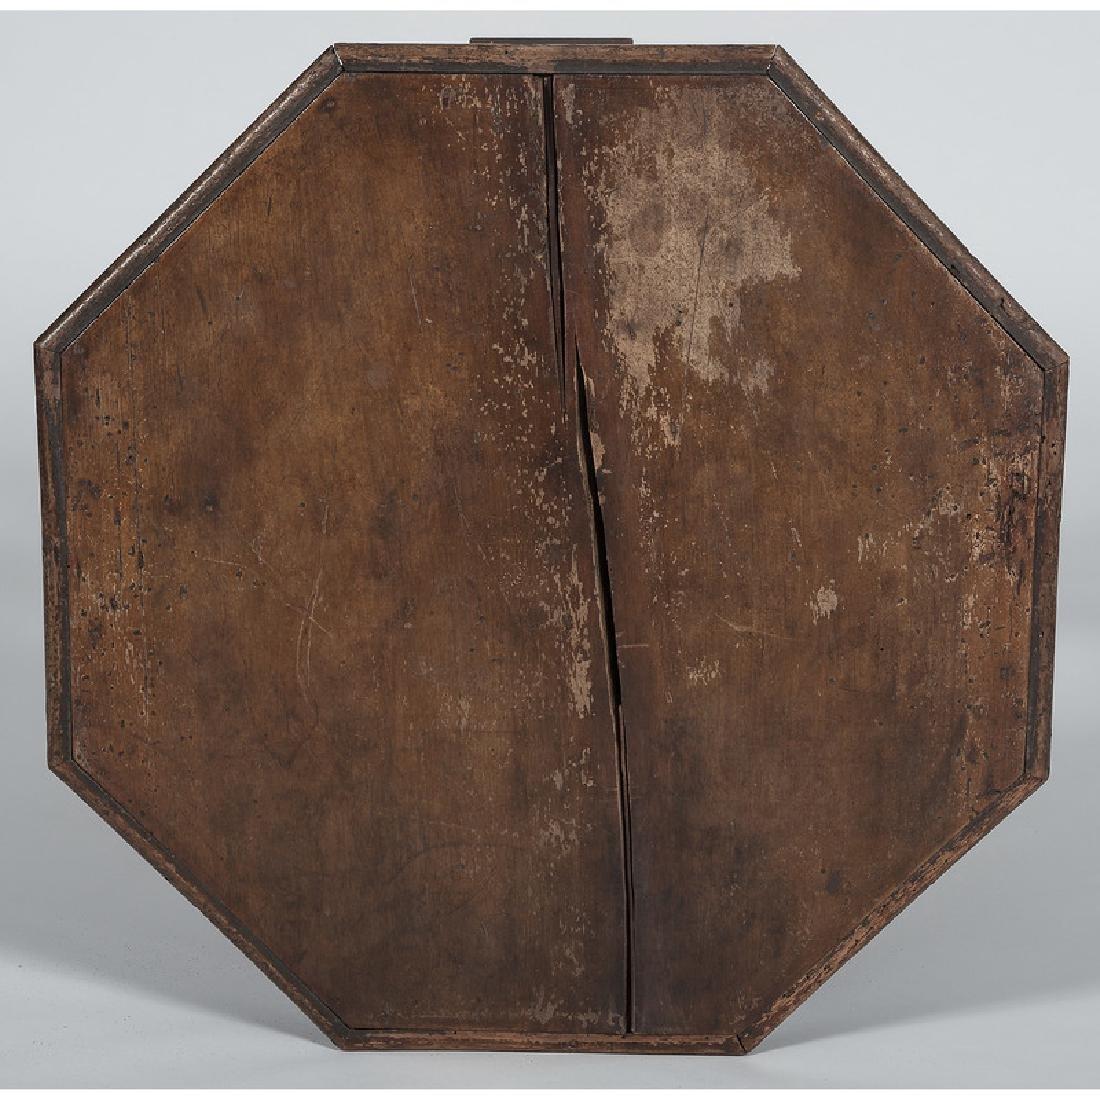 Italian Renaissance-style Octagonal Side Table - 5